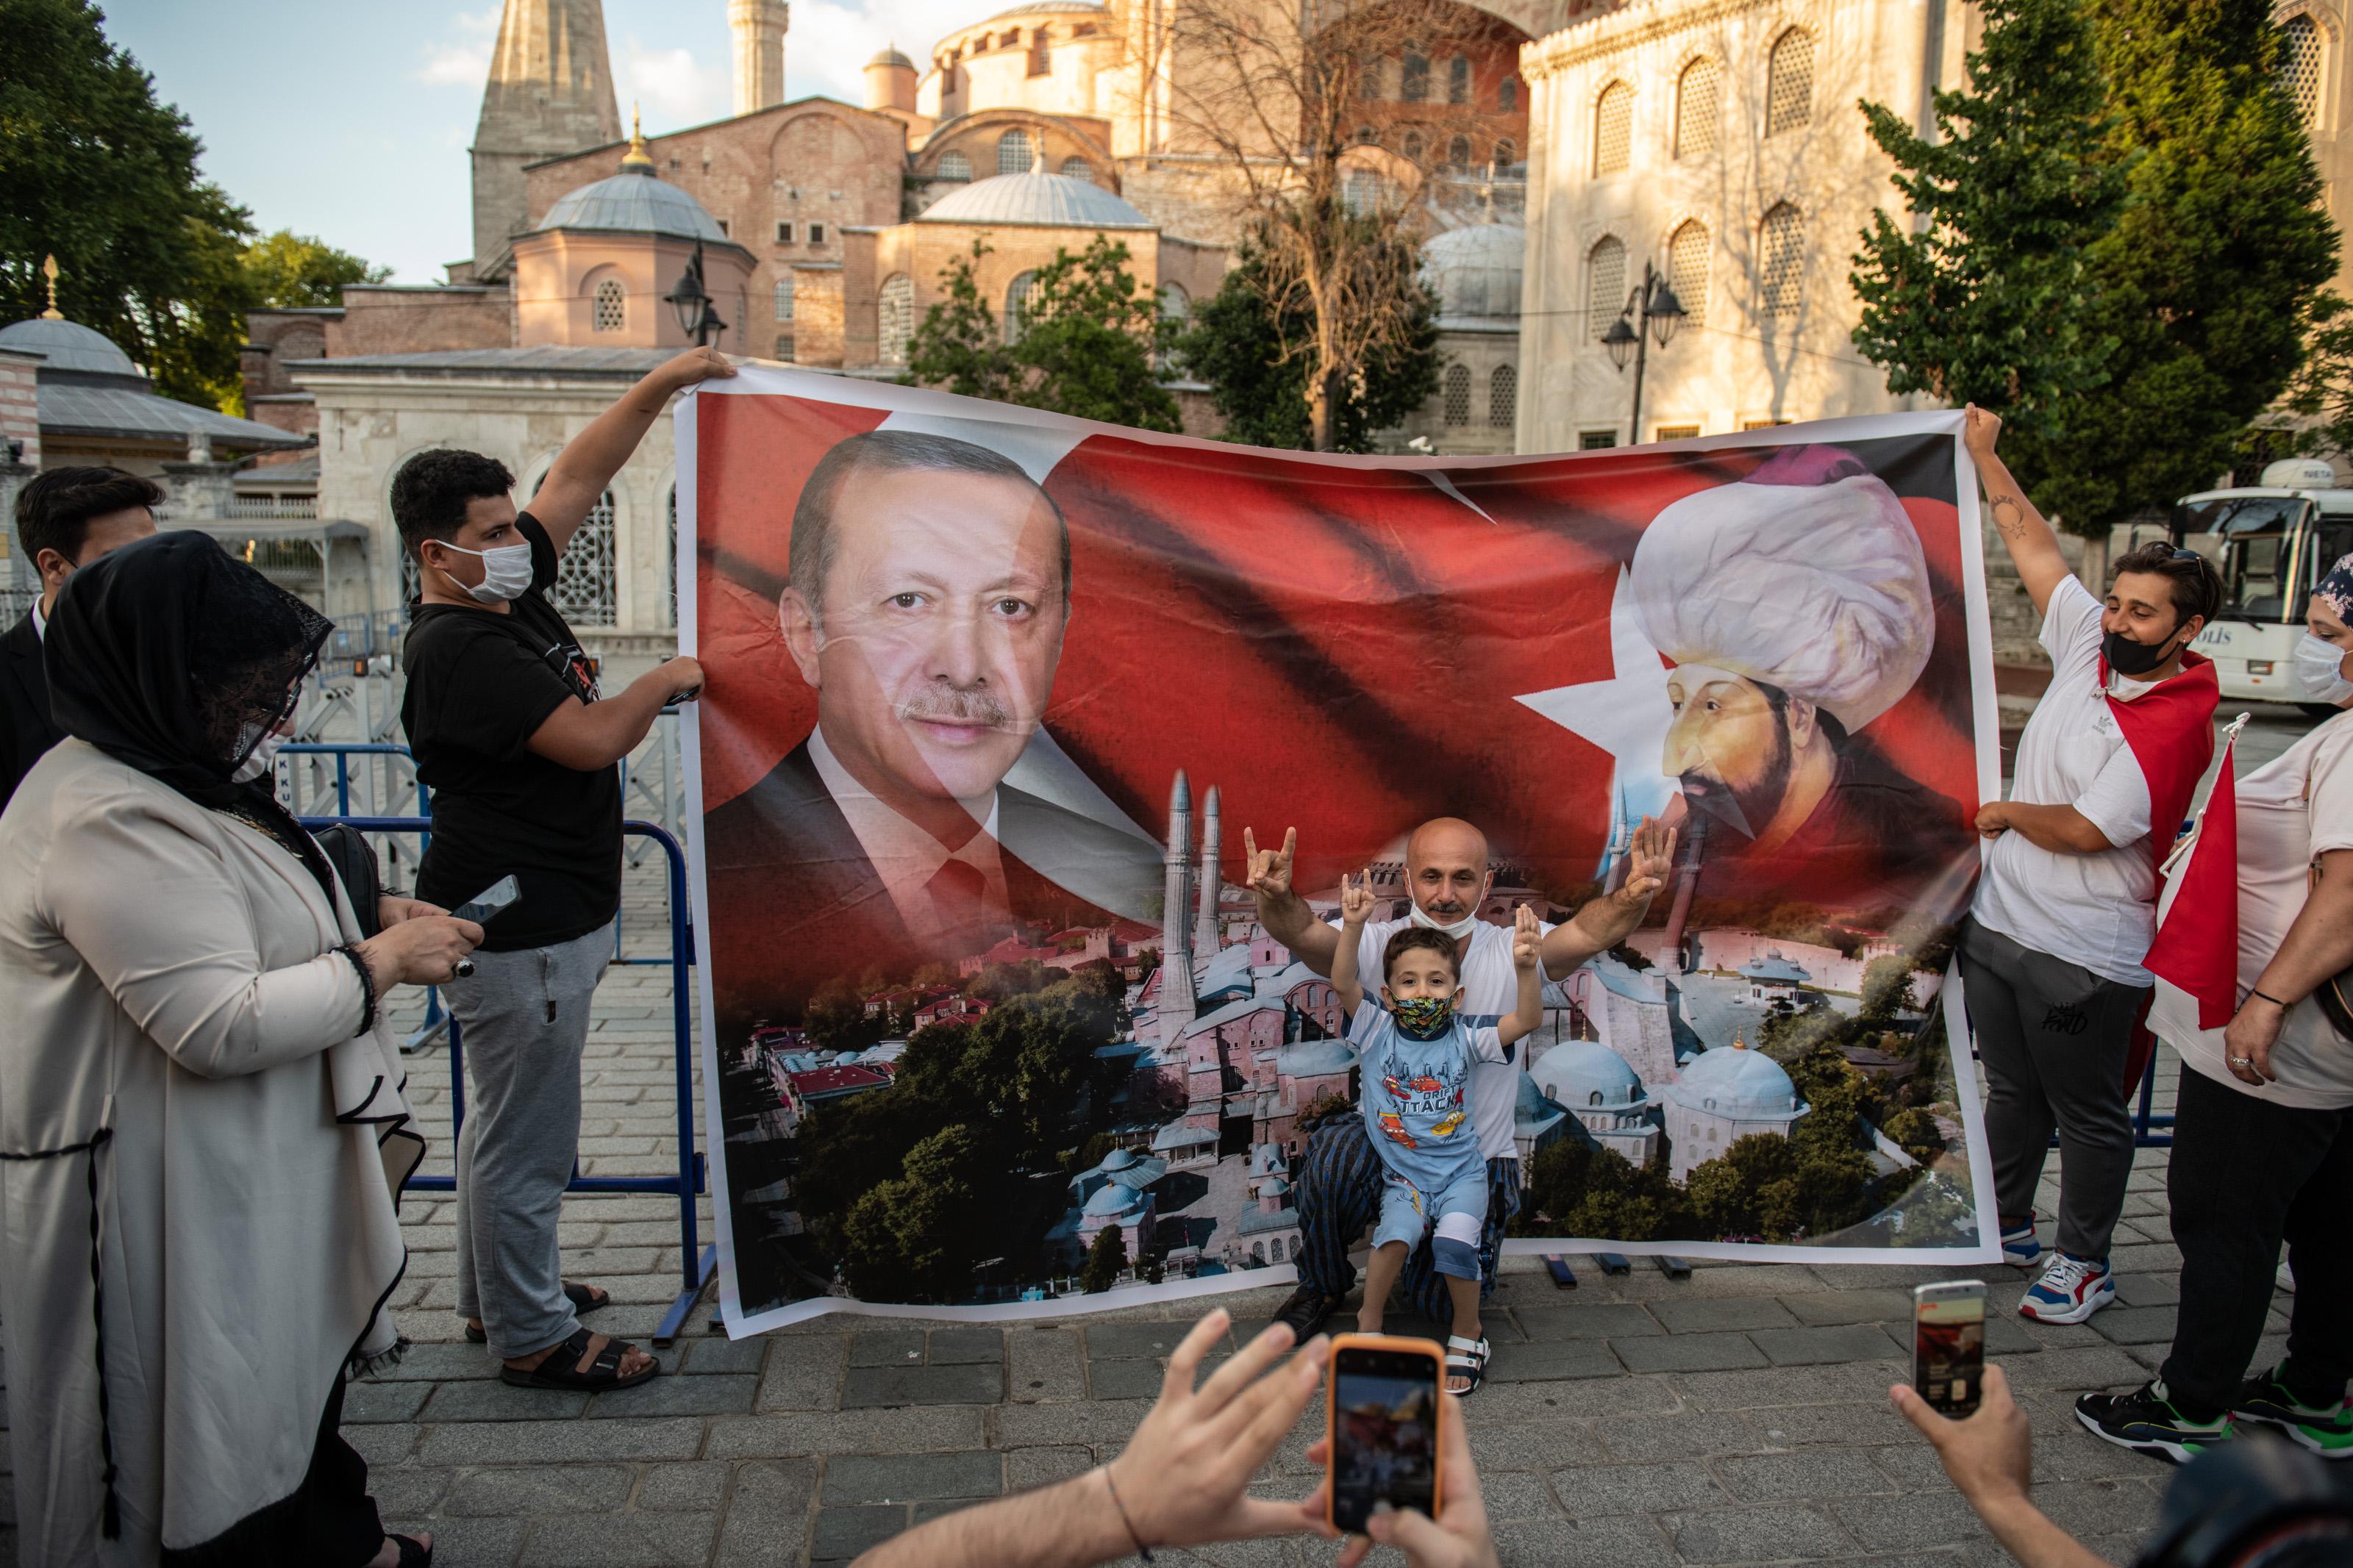 http://Turkey's%20President%20Erdoğan%20Is%20Losing%20Ground%20at%20Home